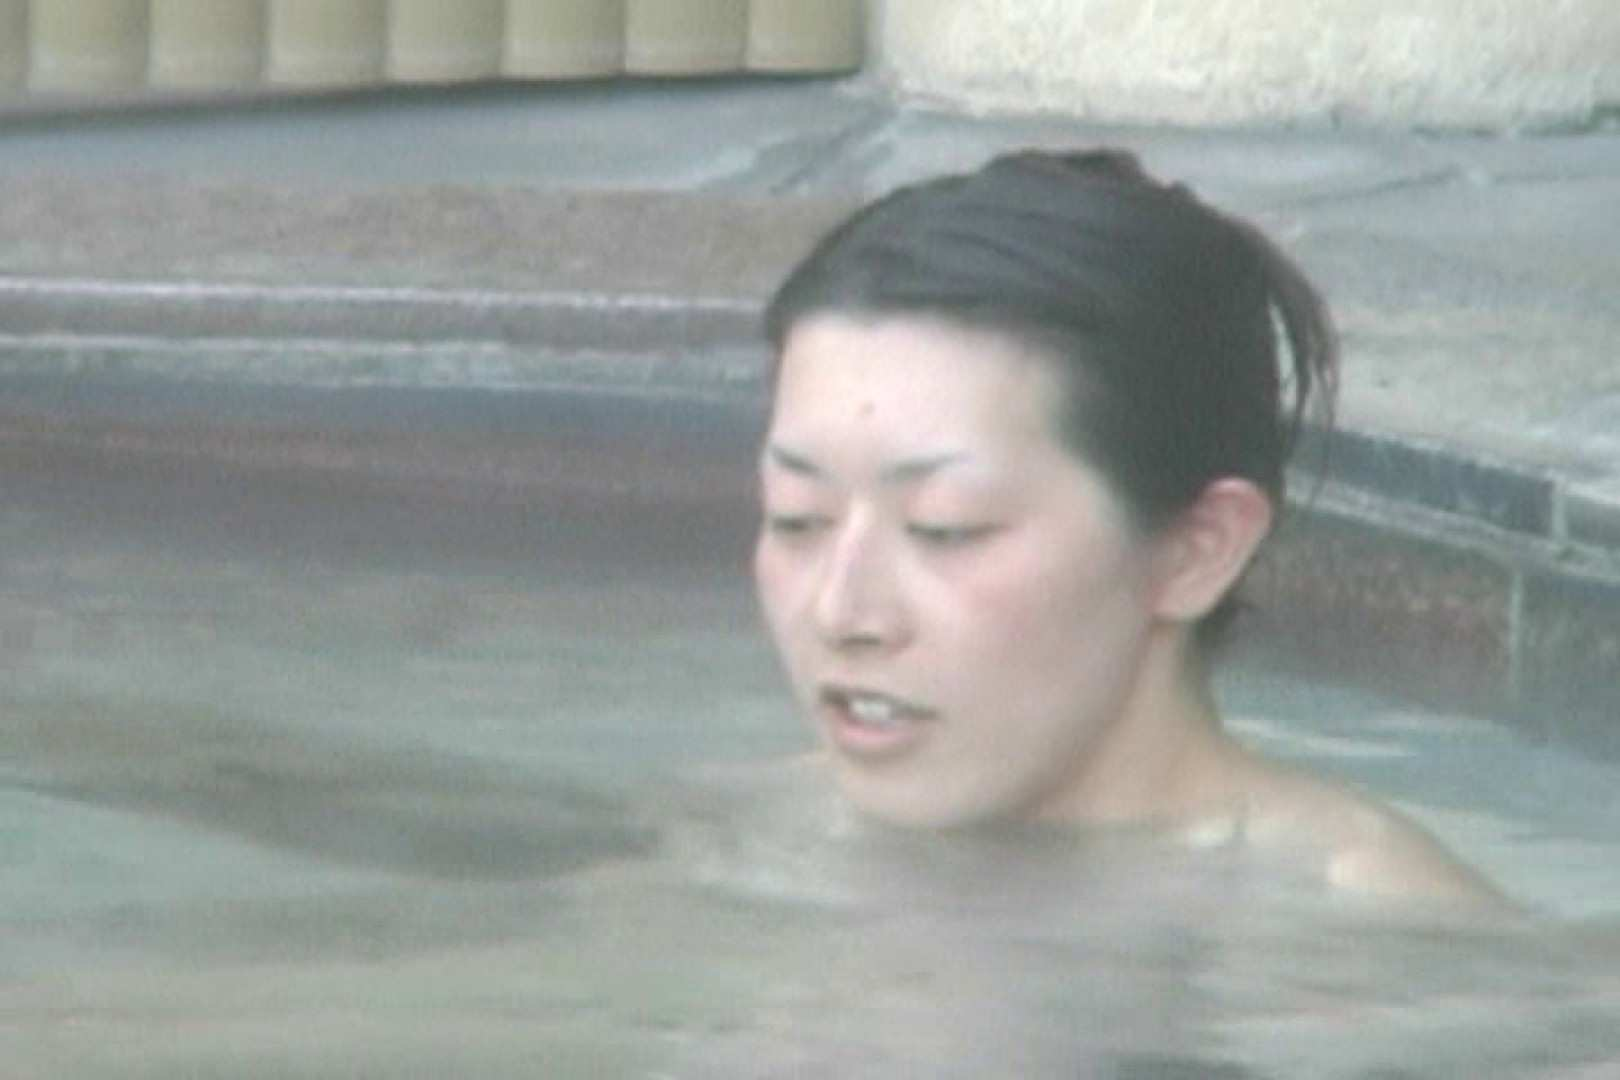 Aquaな露天風呂Vol.589 0   0  74連発 17